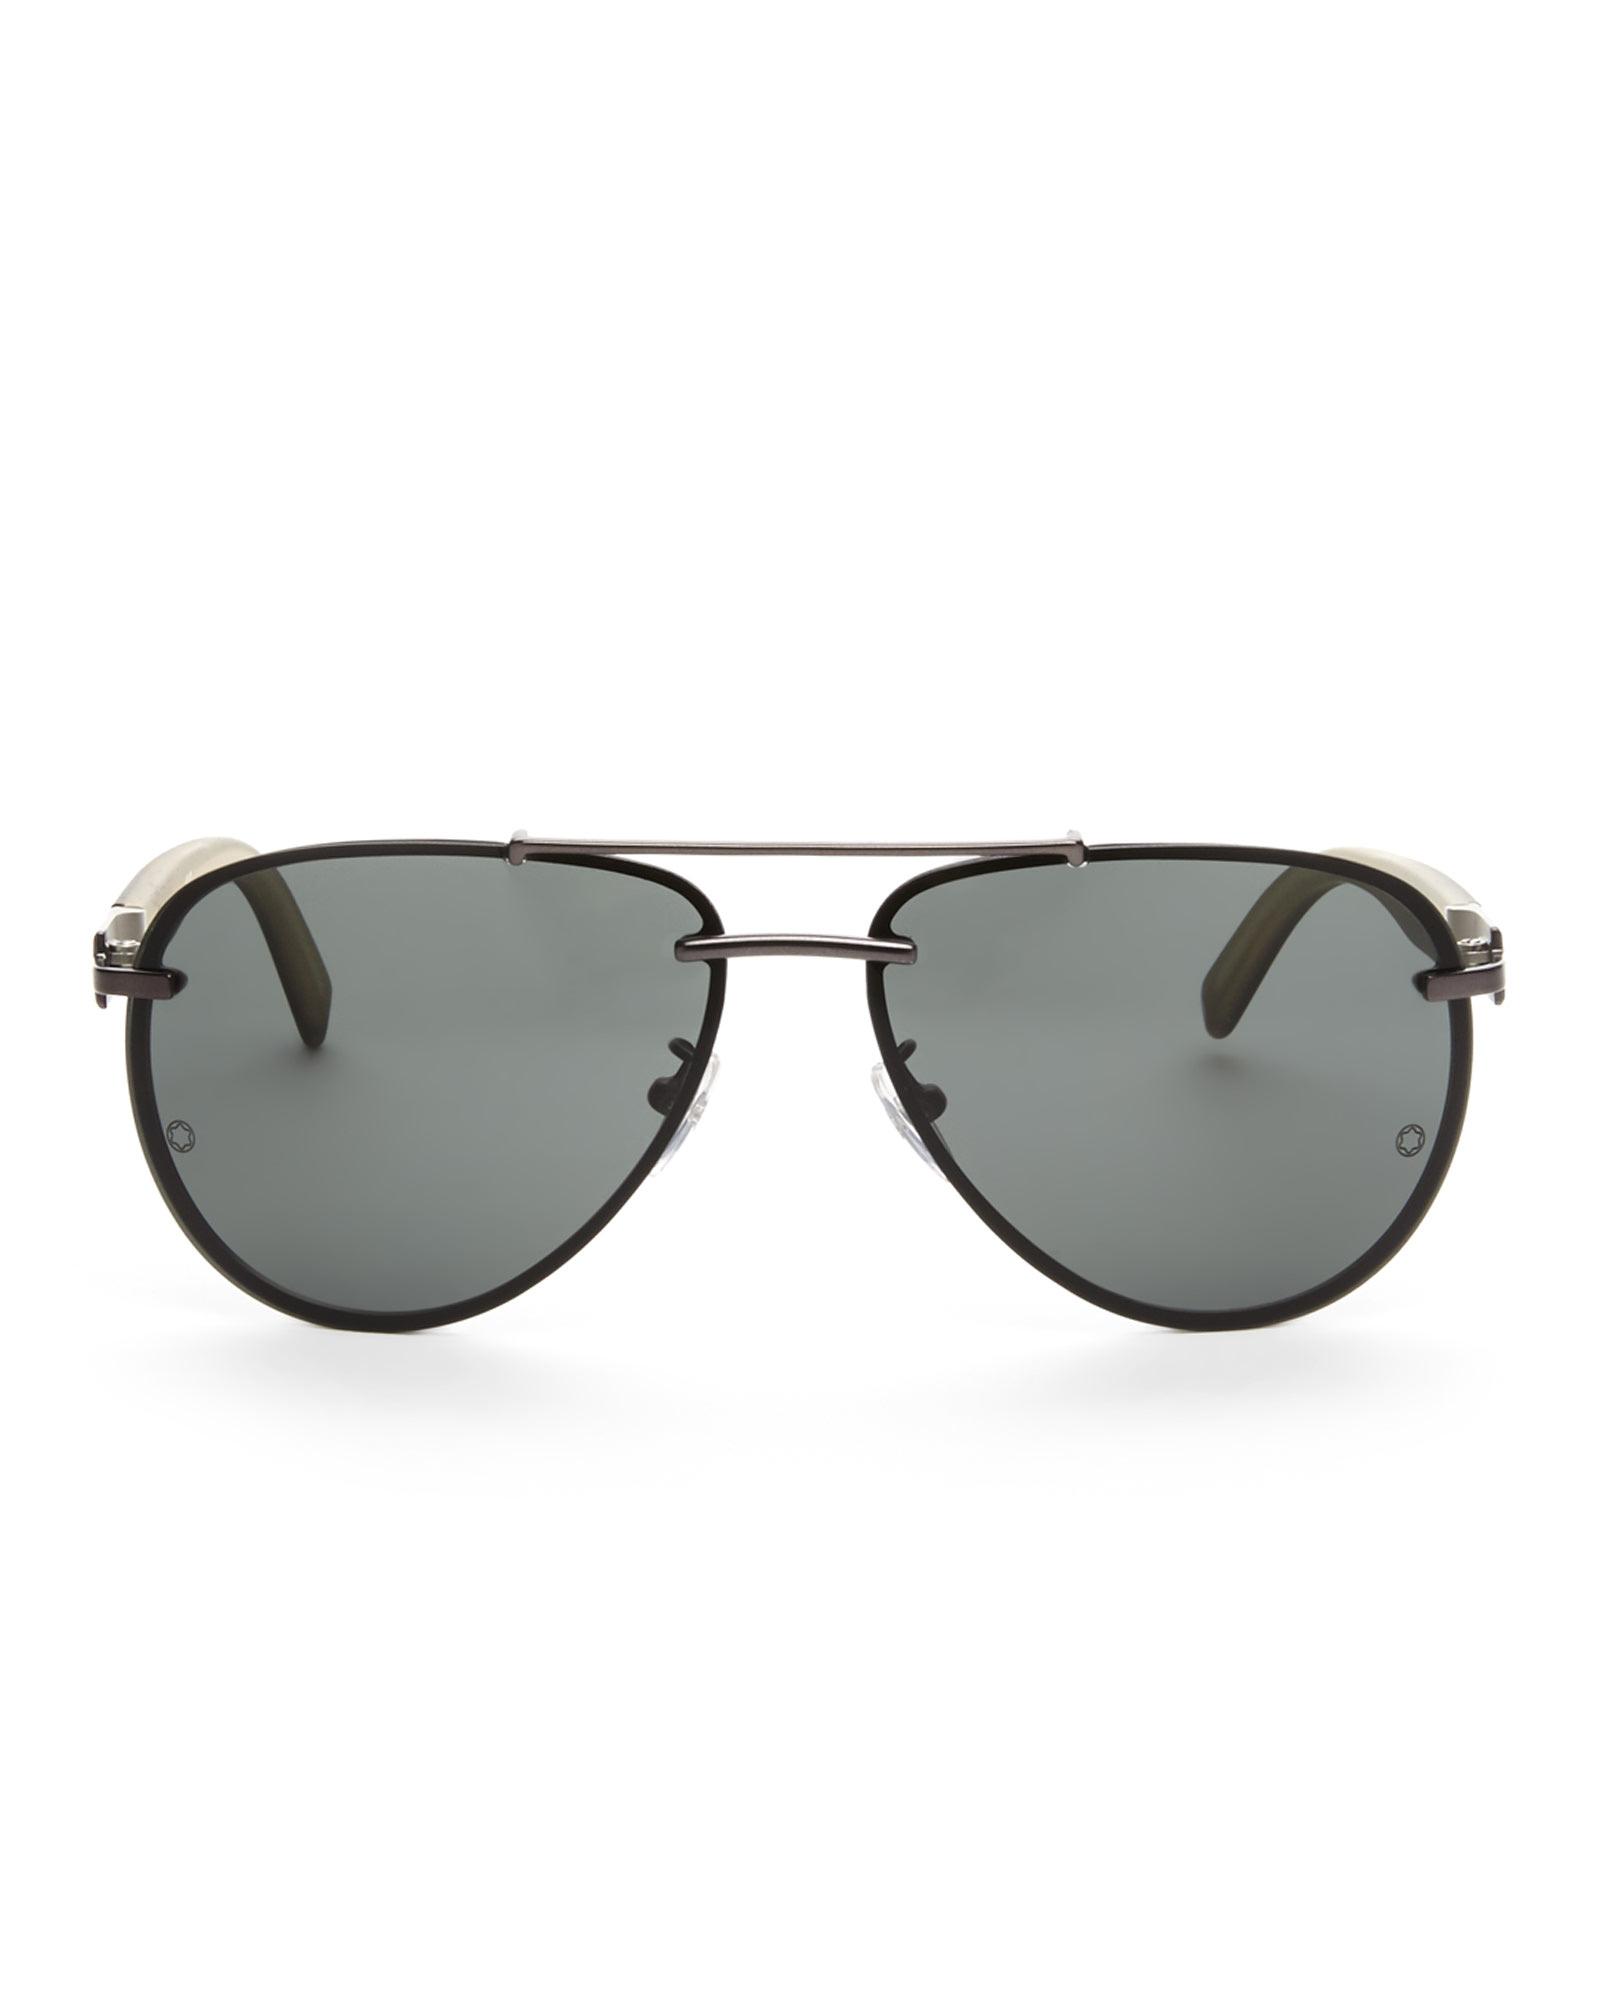 be26109e9d5 Mango Semi Rimless Aviator Sunglasses « Heritage Malta